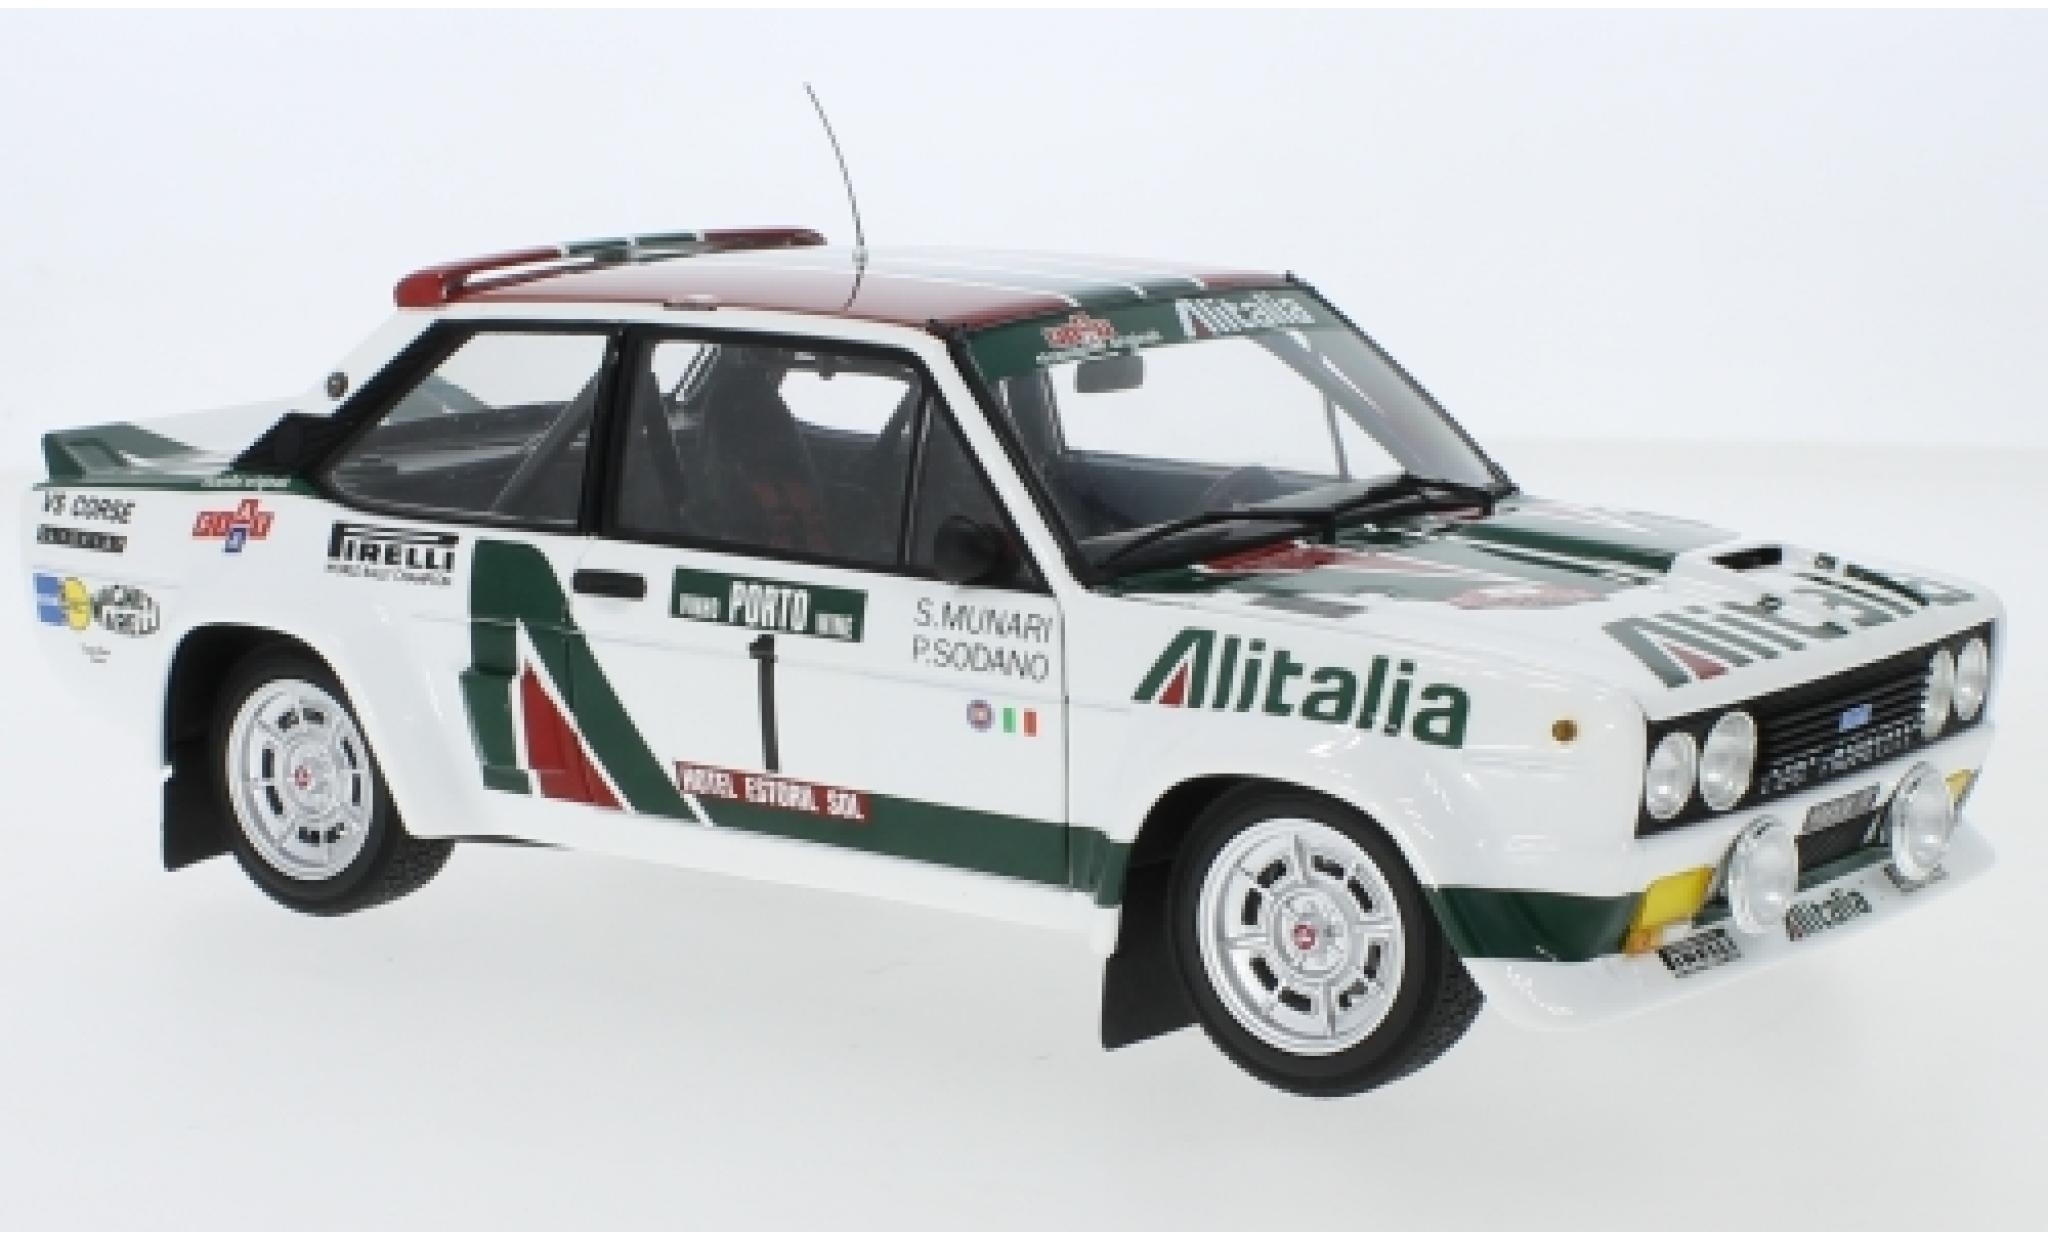 Fiat 131 1/18 Kyosho Abarth No.1 Alitalia Alitalia Rallye WM Rally Portugal 1978 S.Munari/P.Sodano